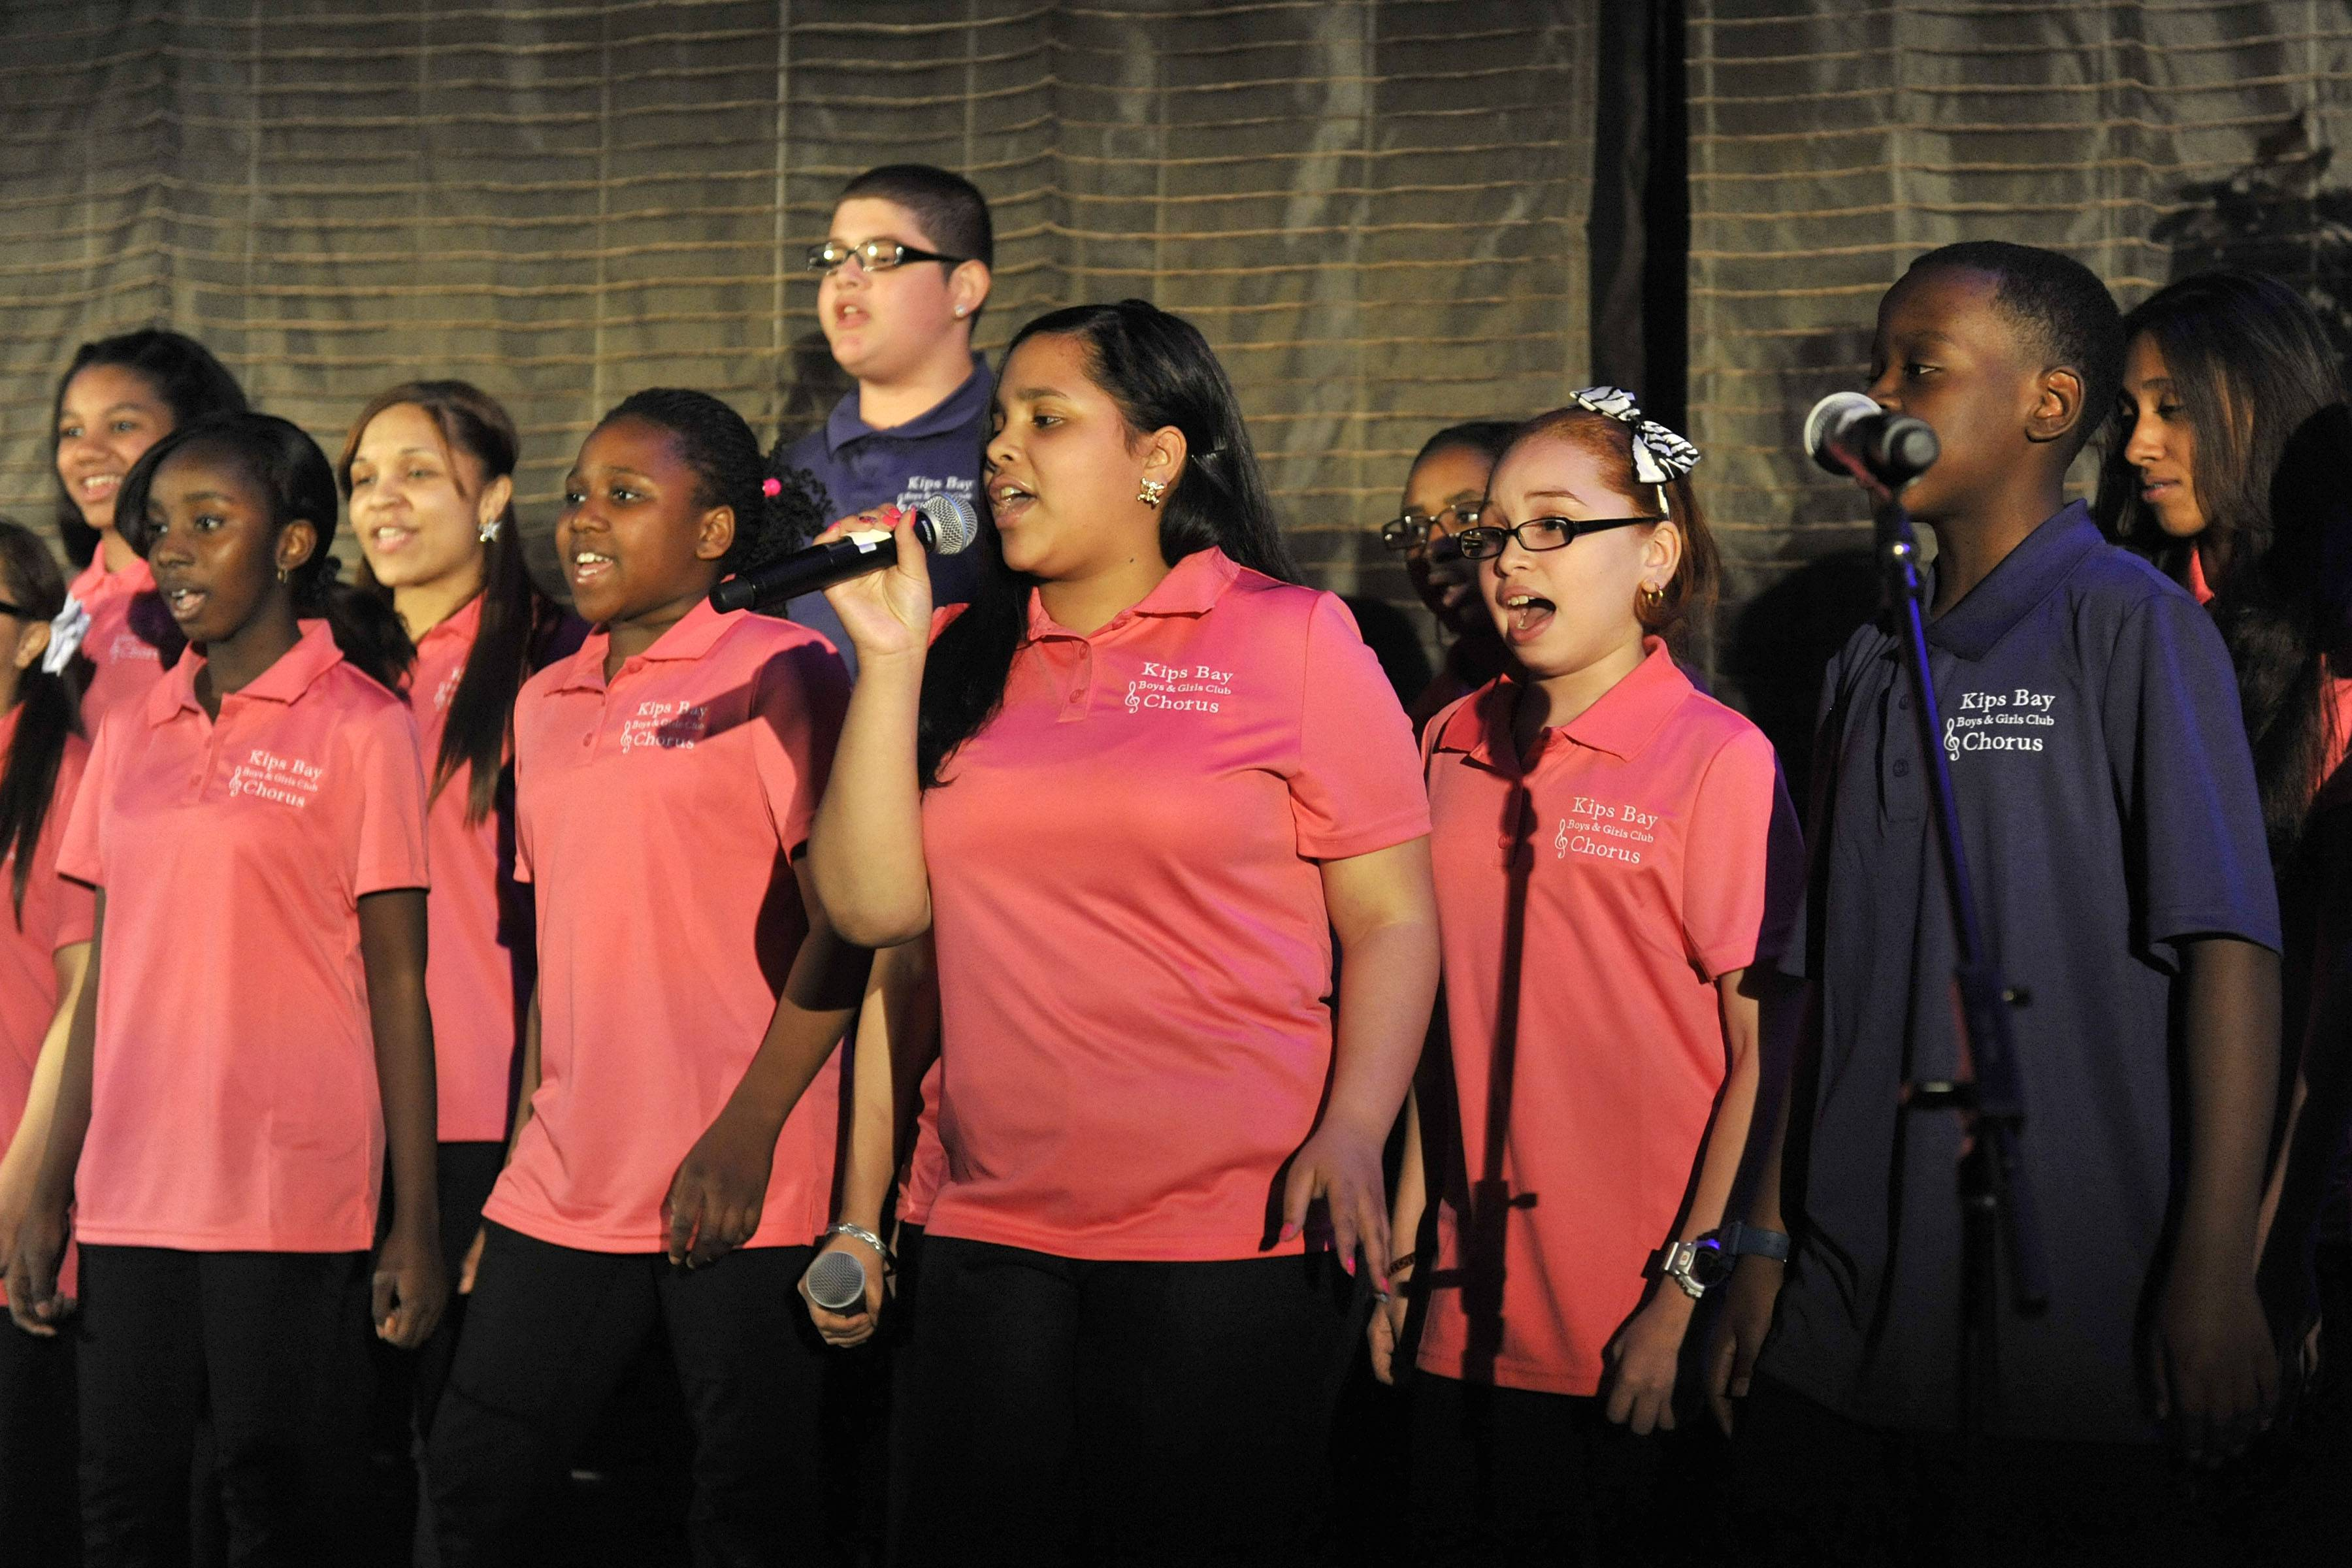 Kips Bay Boys & Girls Club Chorus